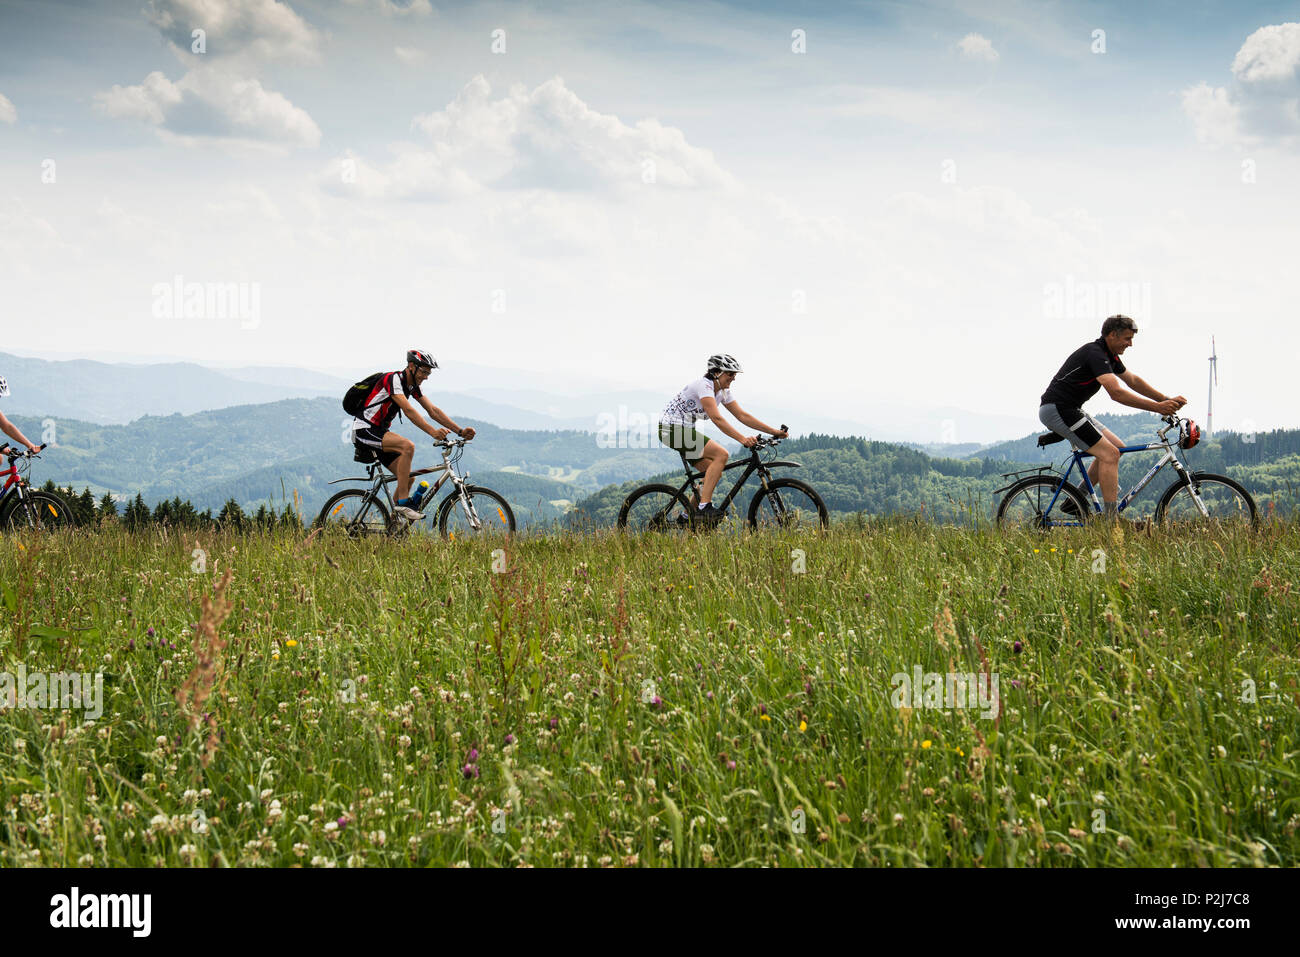 Mountain bikers near Freiamt, north of Freiburg im Breisgau, Black Forest, Baden-Wuerttemberg, Germany - Stock Image